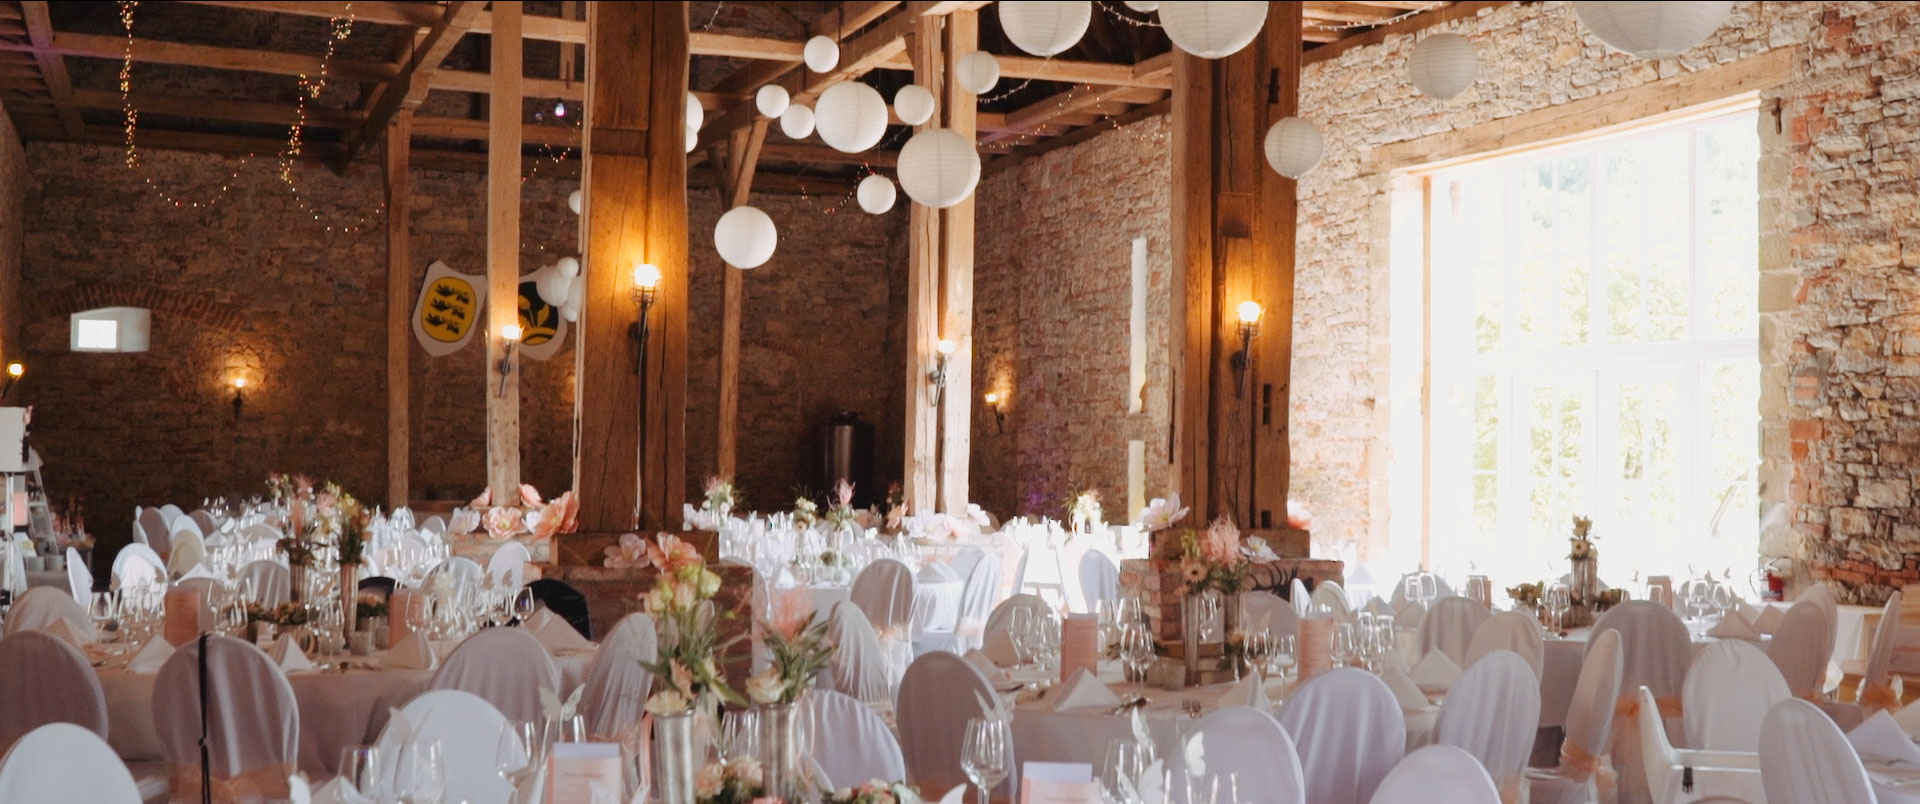 Hochzeitsfilm in Schloss Assumstadt Deko Scheune